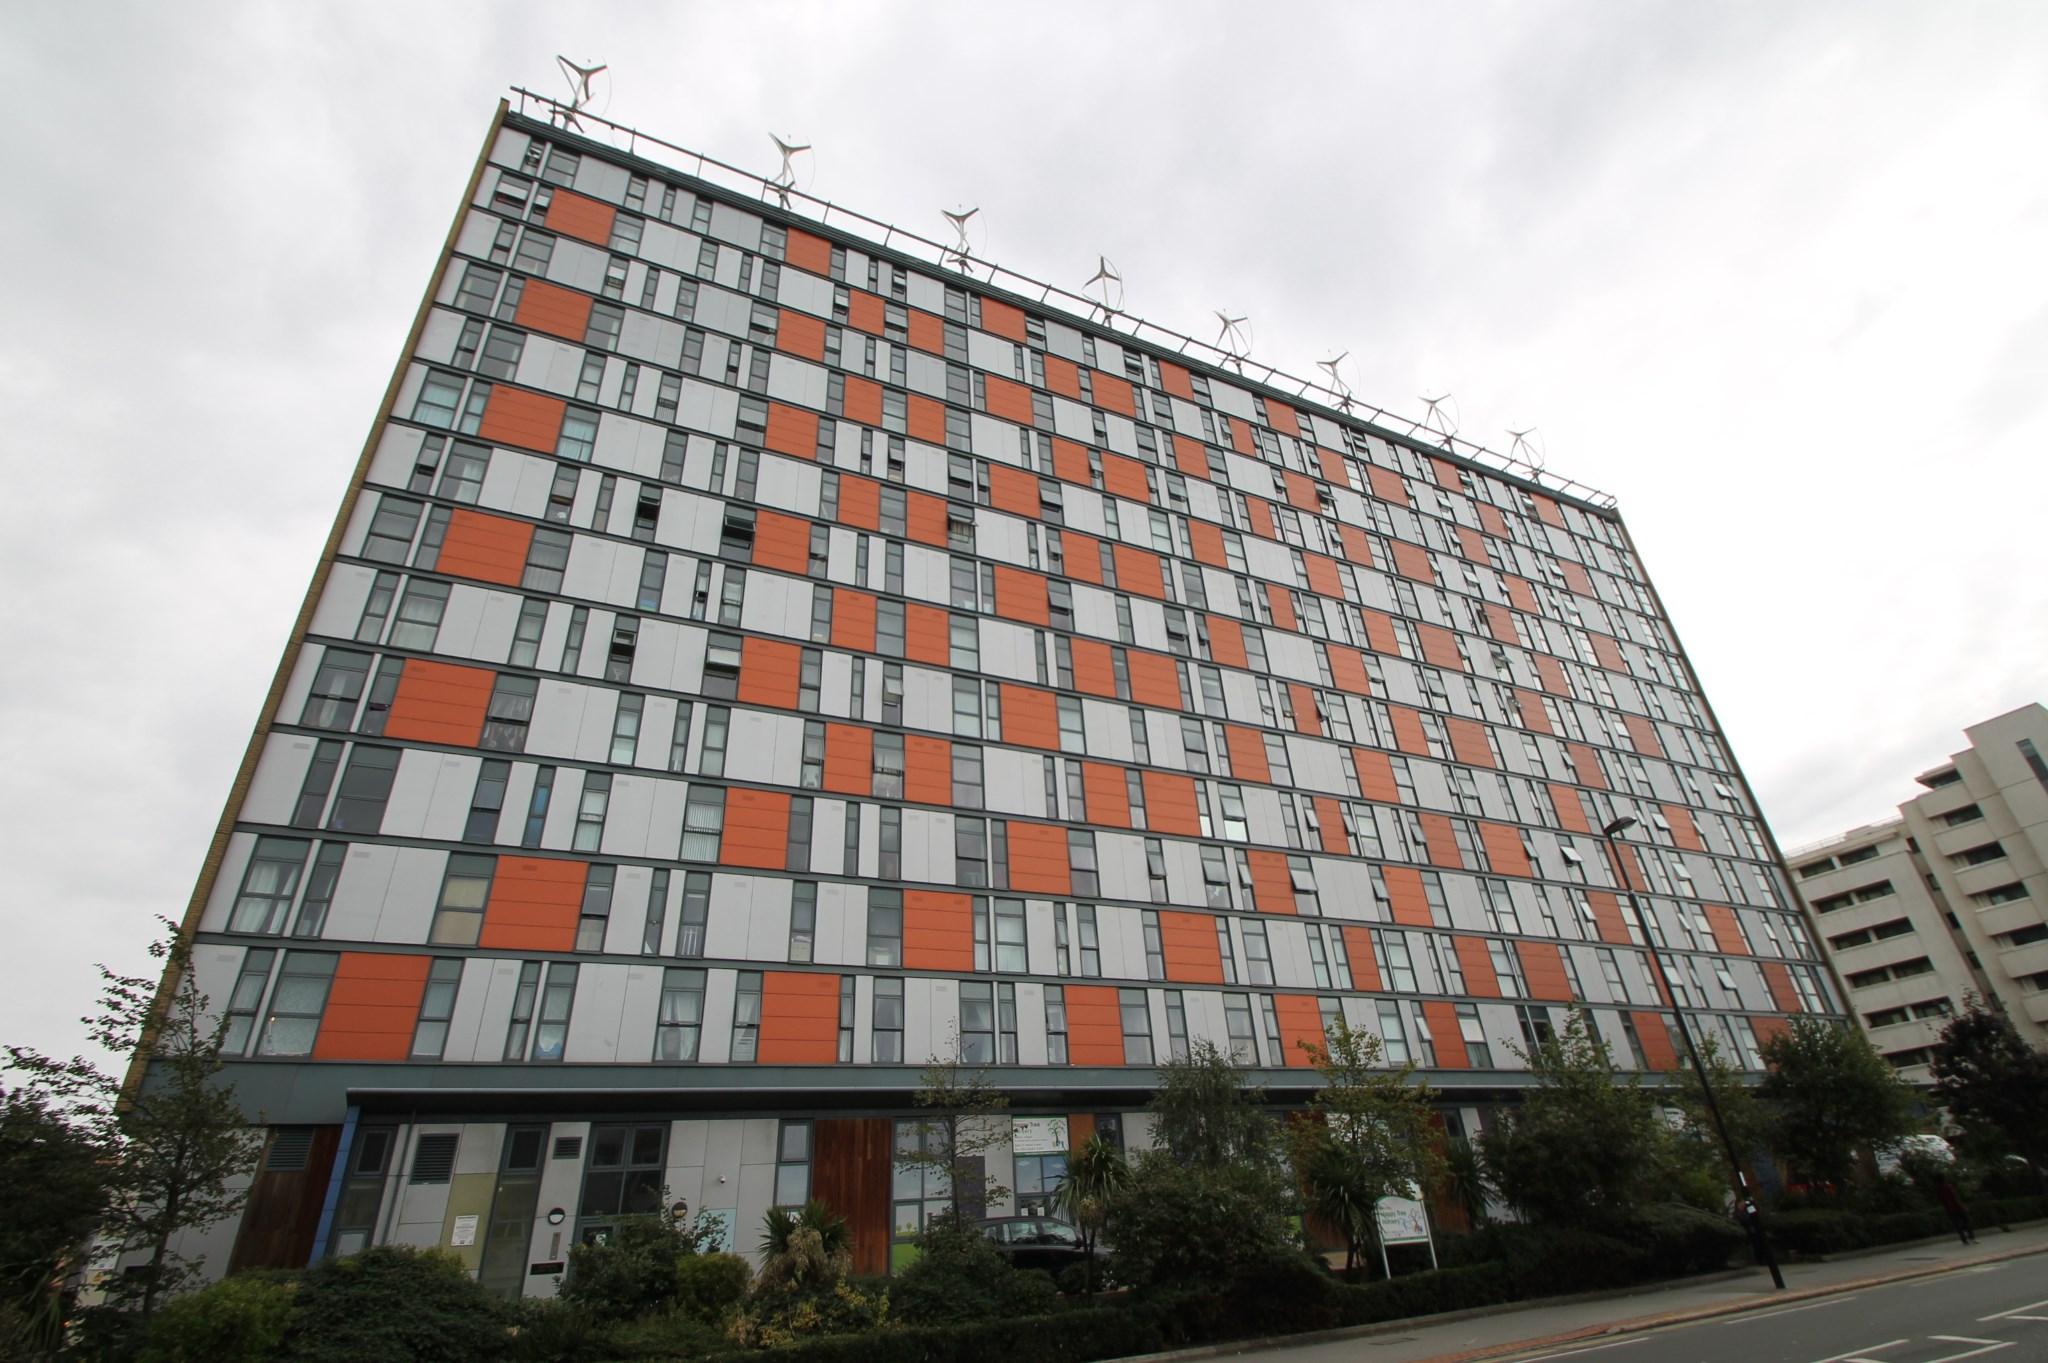 City House, 420 London Road, Croydon, CR0